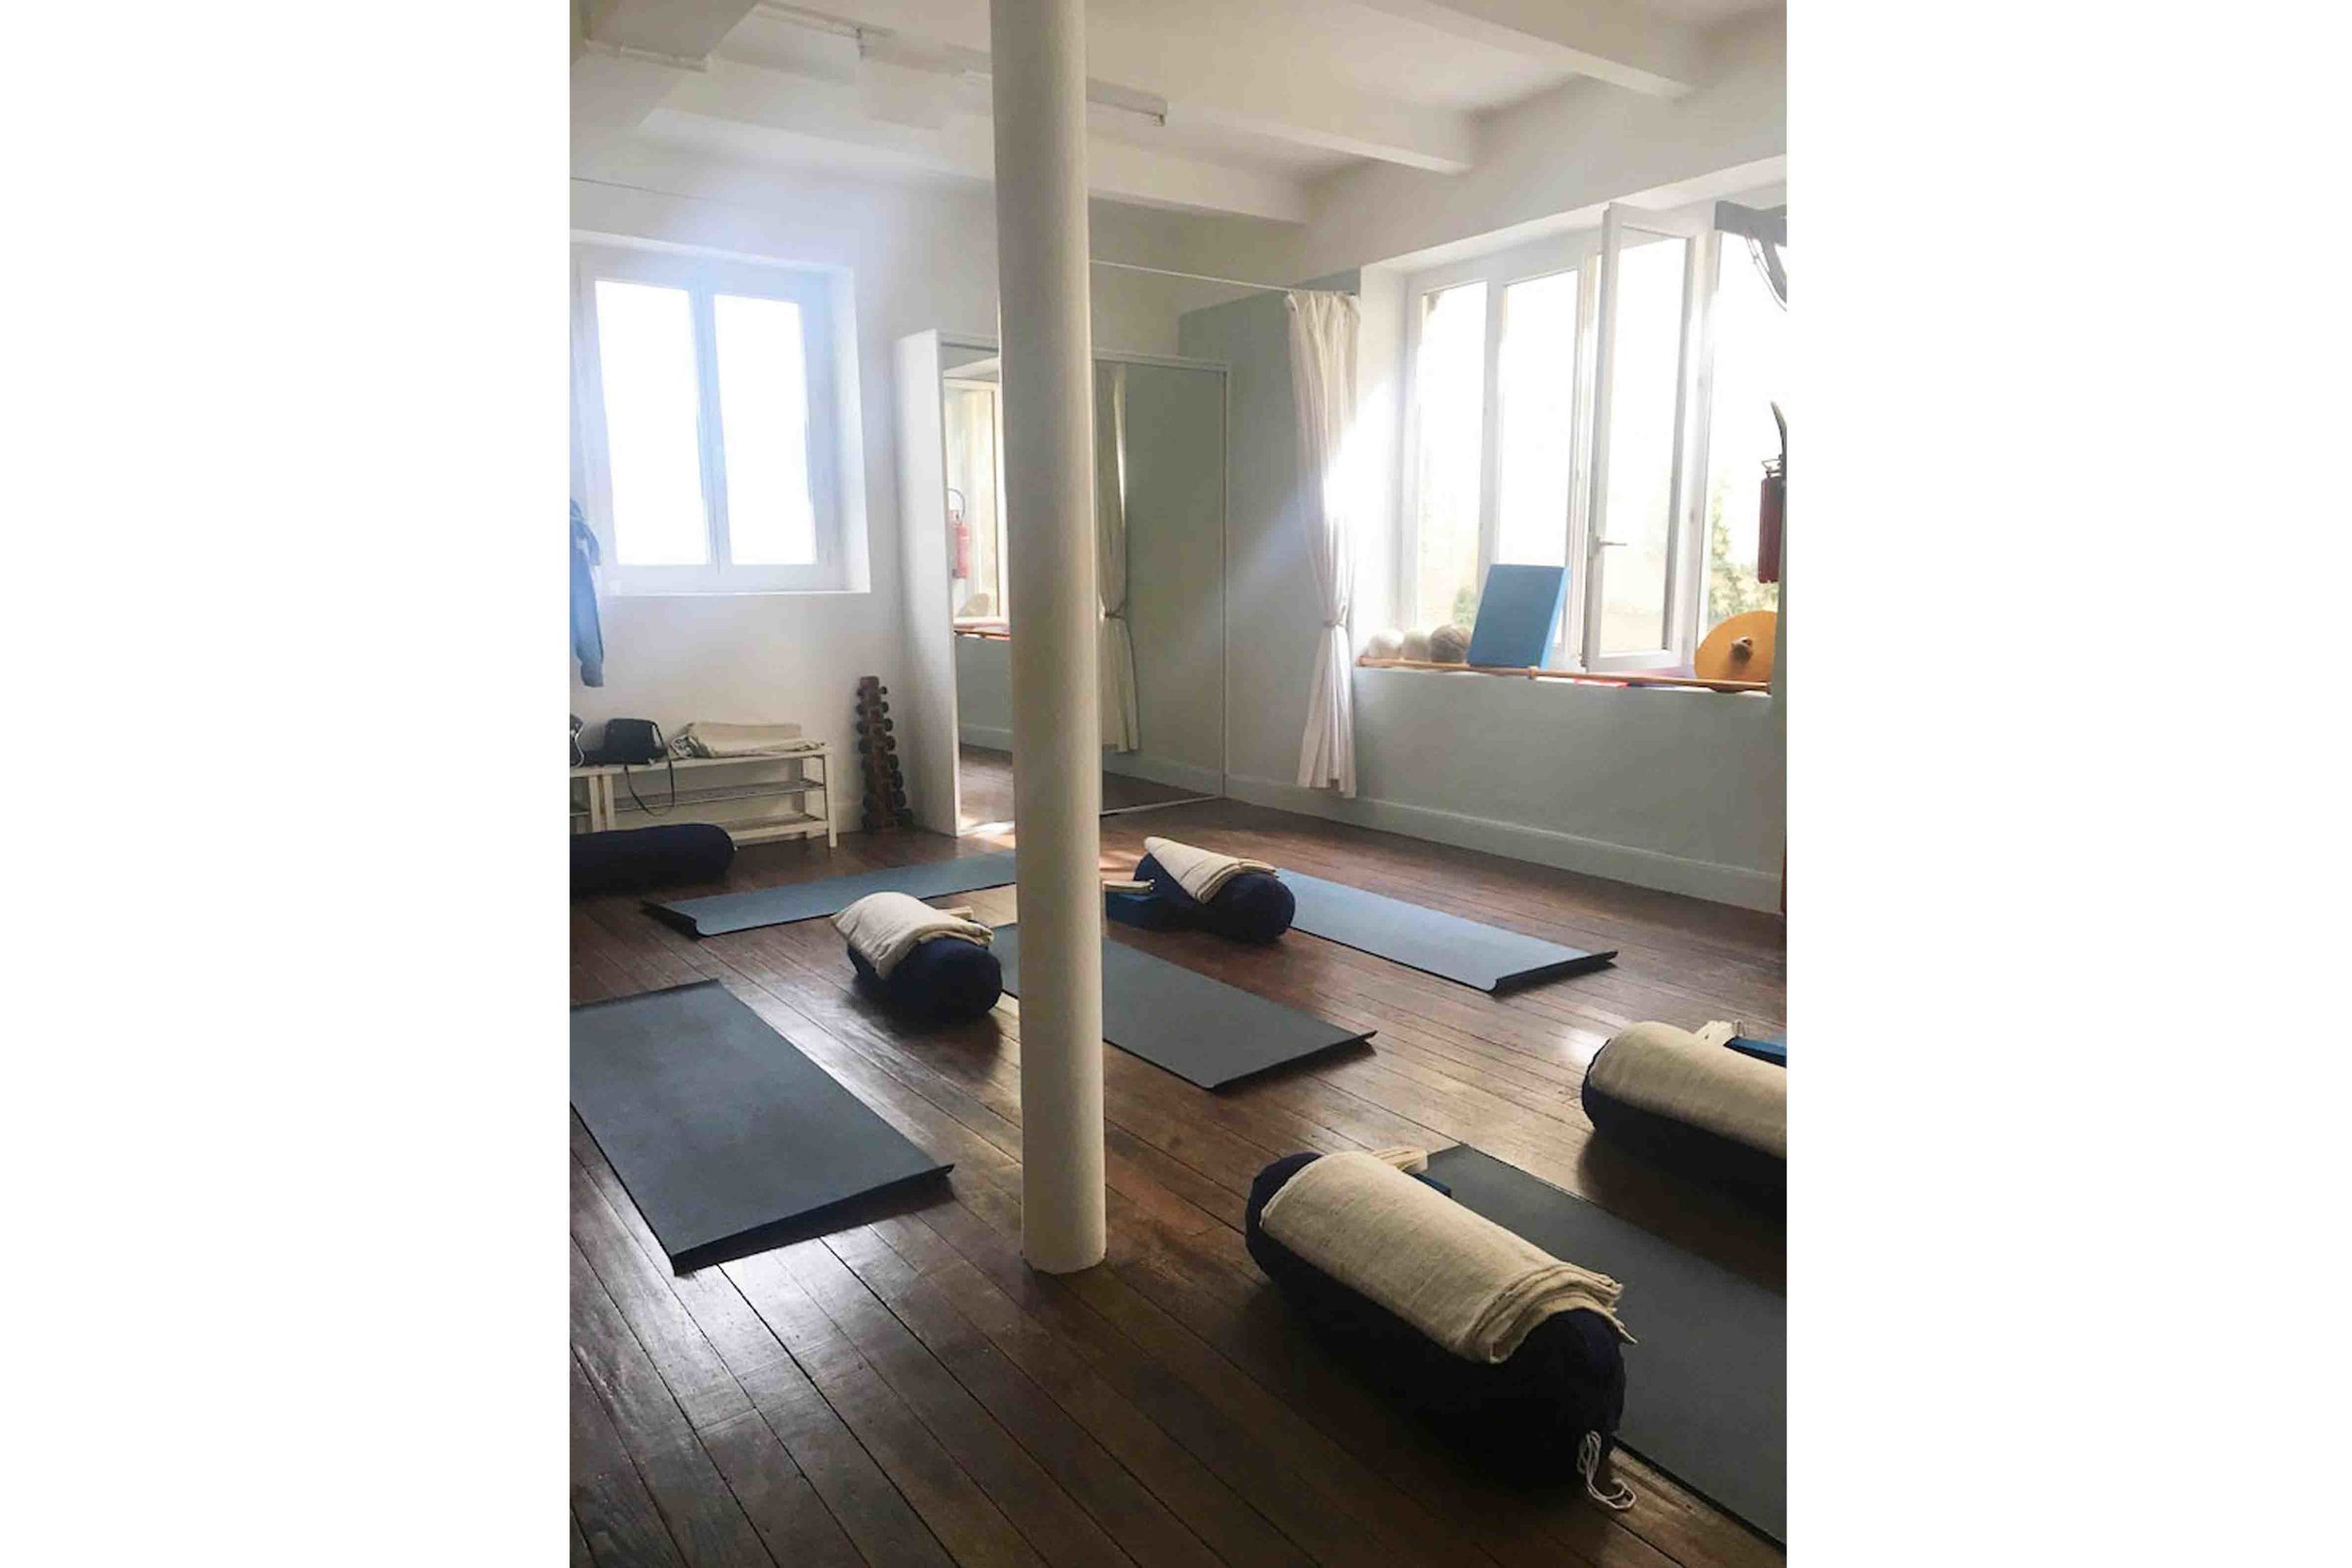 osteopathe-biarritz-salle-yoga.jpg